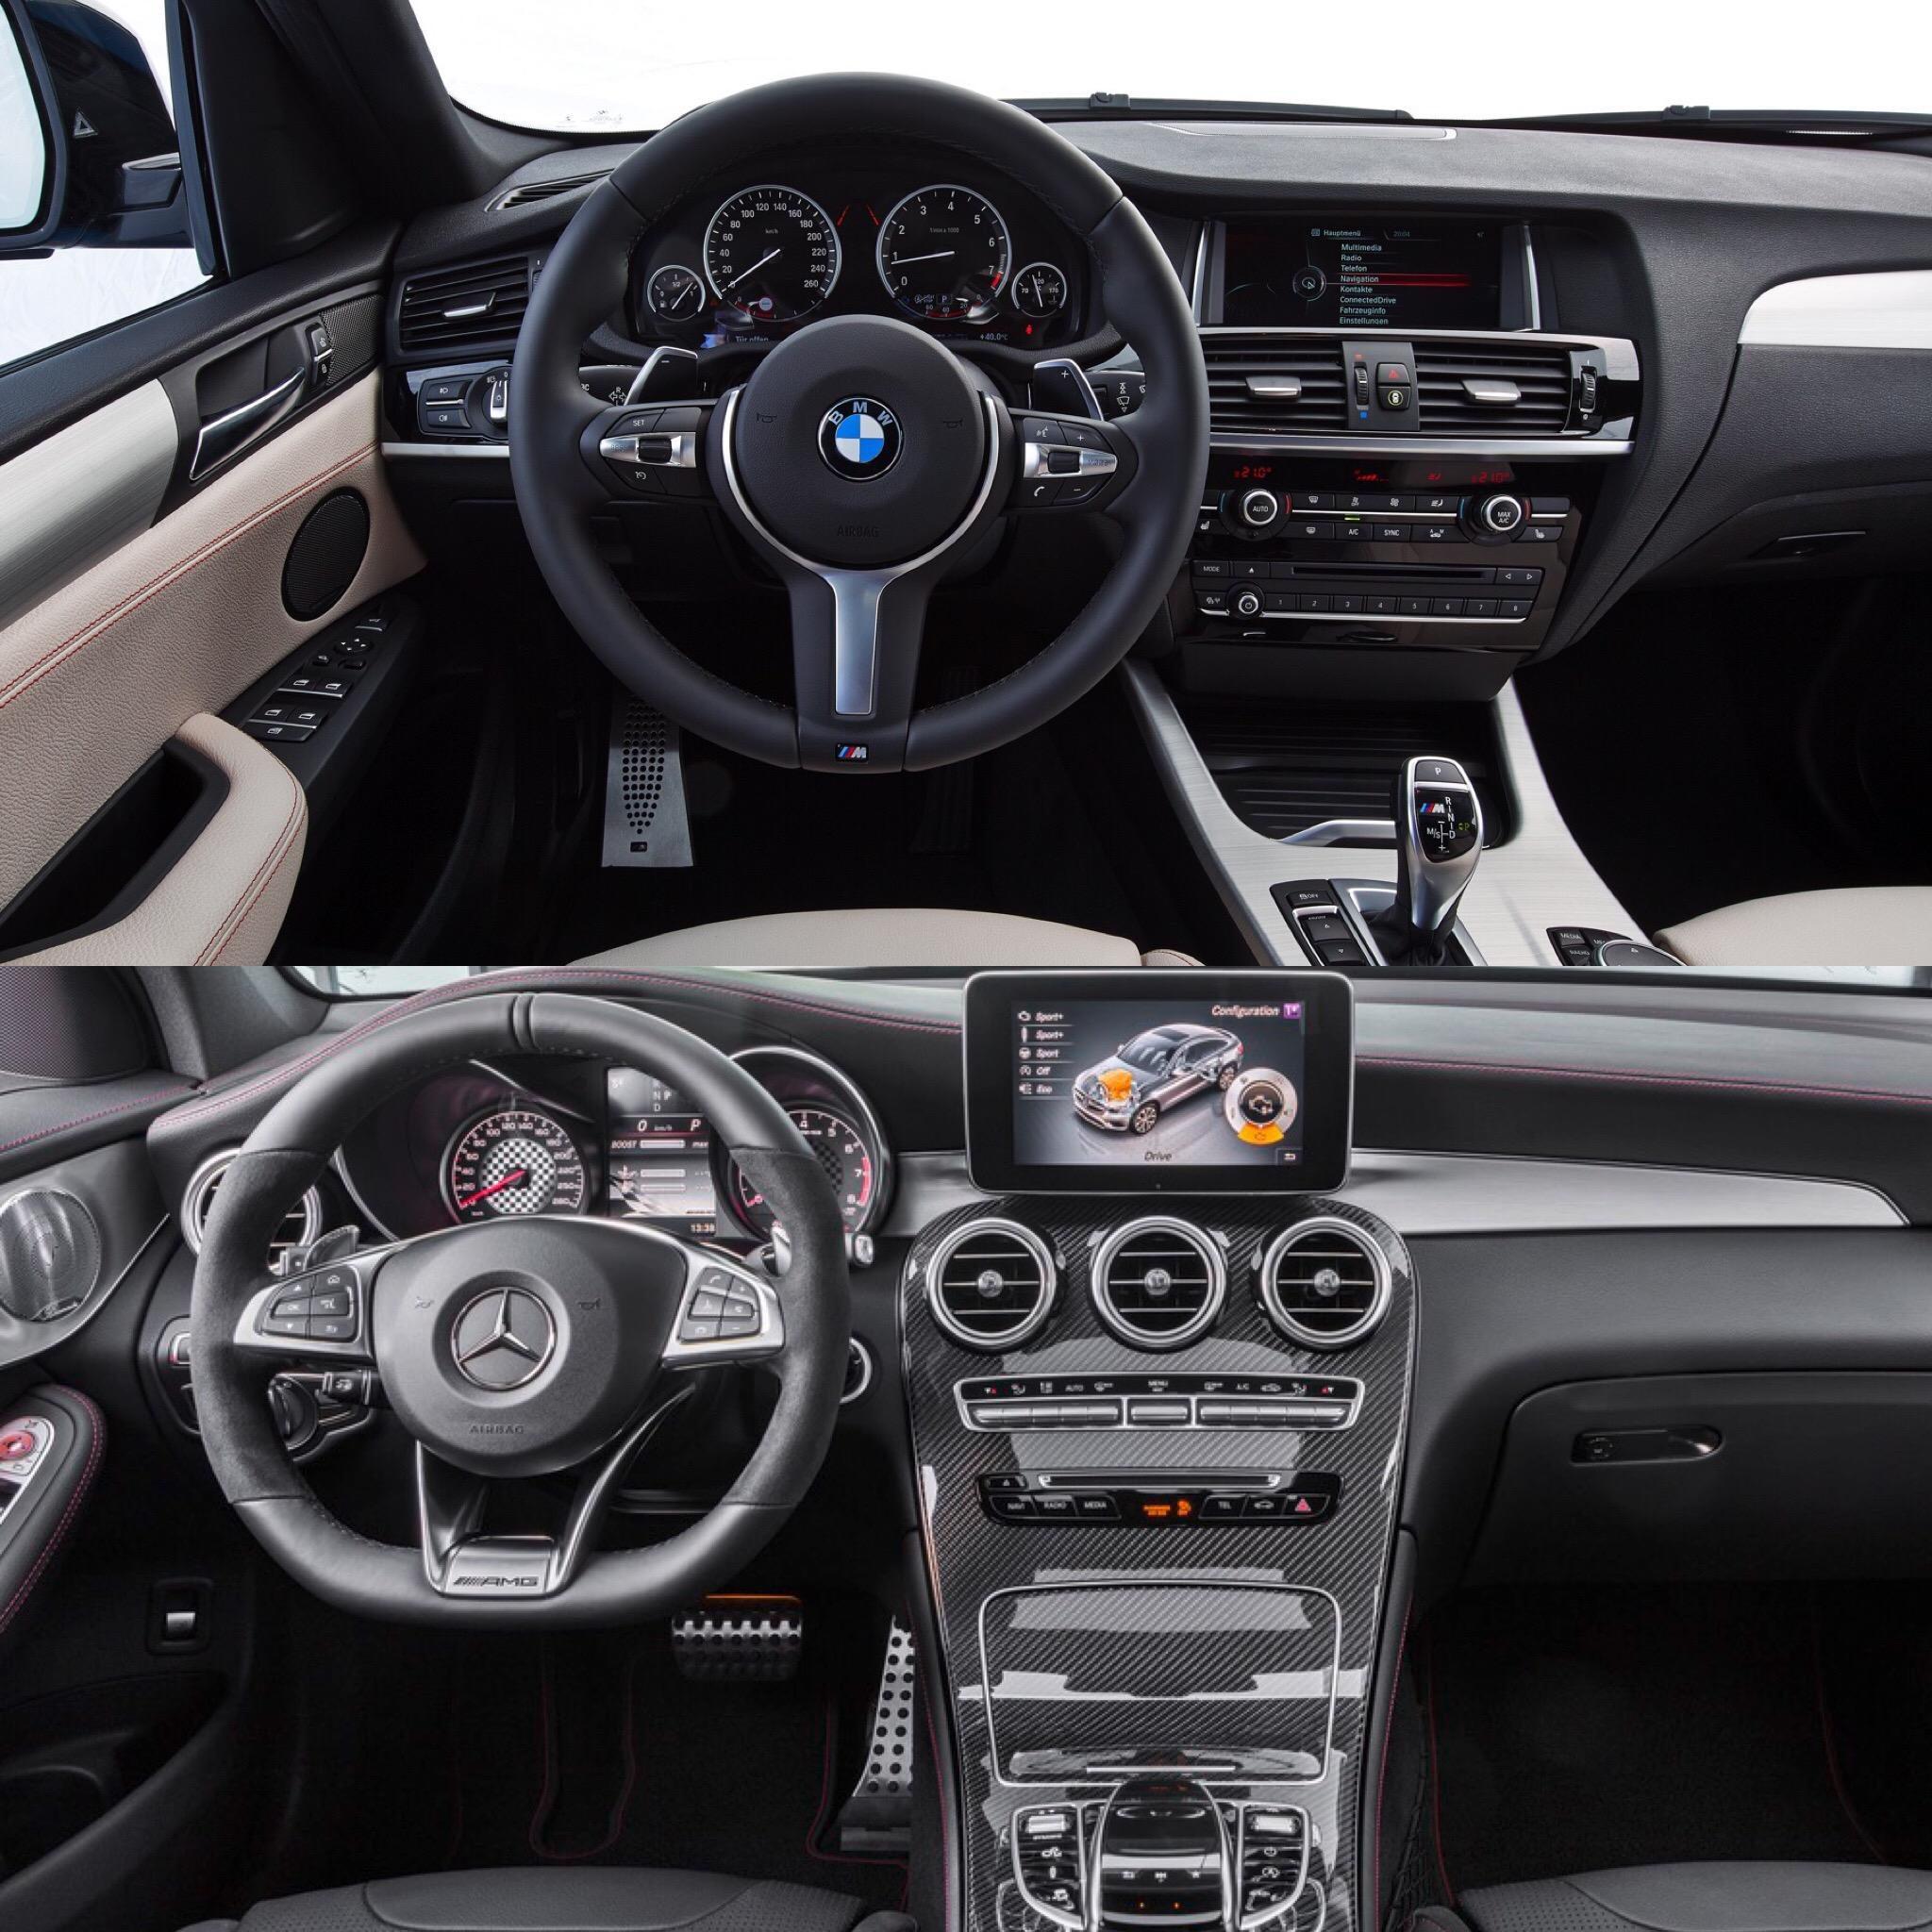 2019 Mercedes Benz Glc Coupe Camshaft: PHOTO COMPARISON: BMW X4 M40i Vs Mercedes-AMG GLC43 Coupe